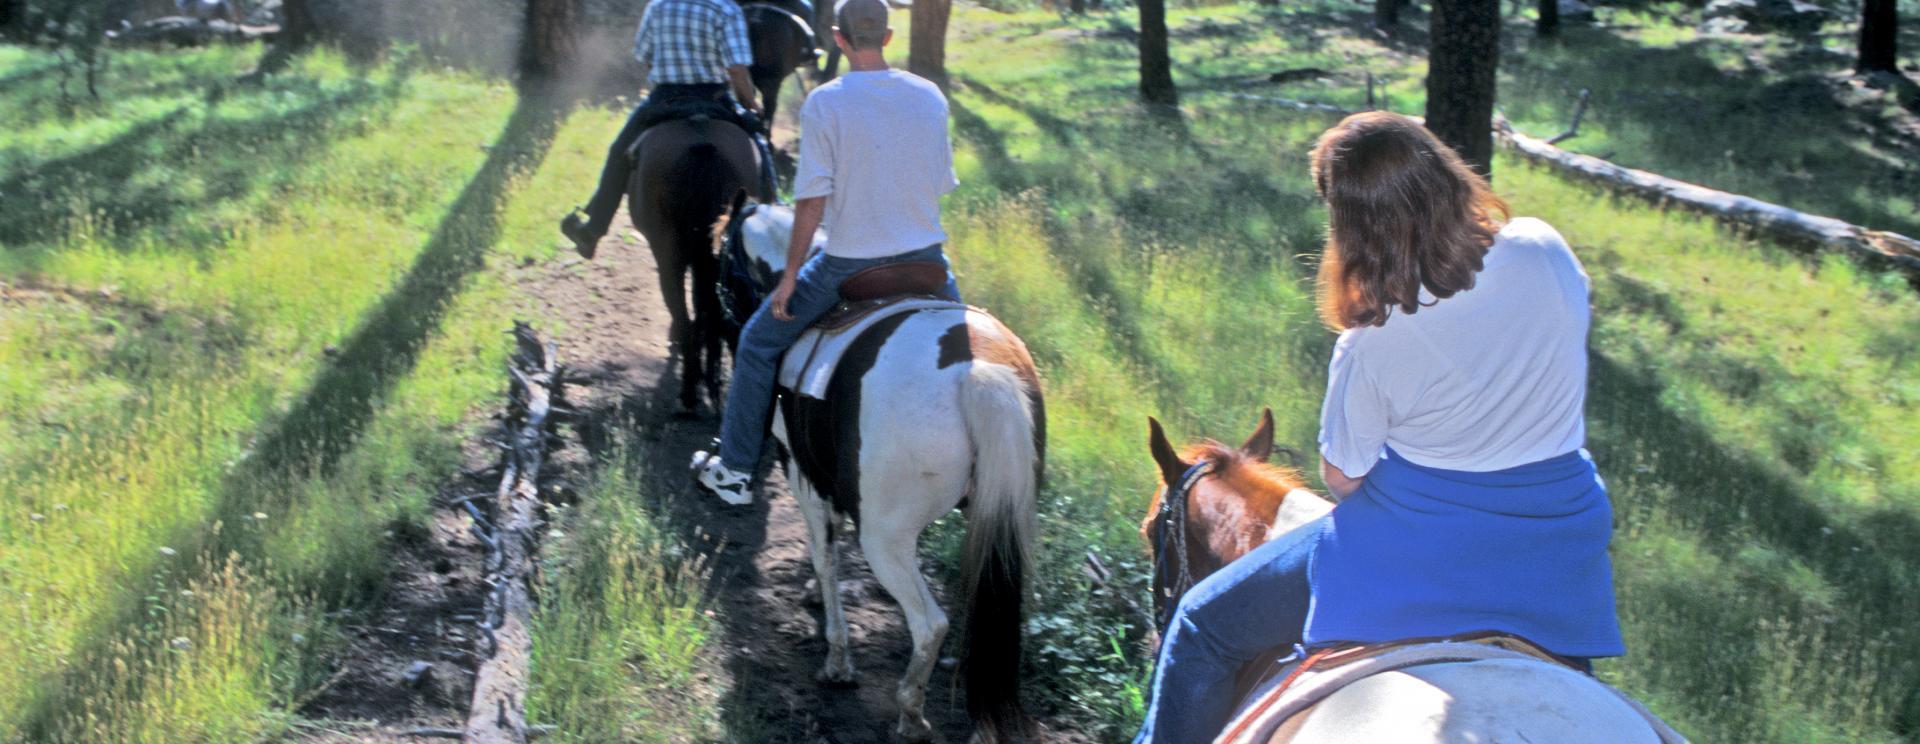 Rockin' R Trail Rides